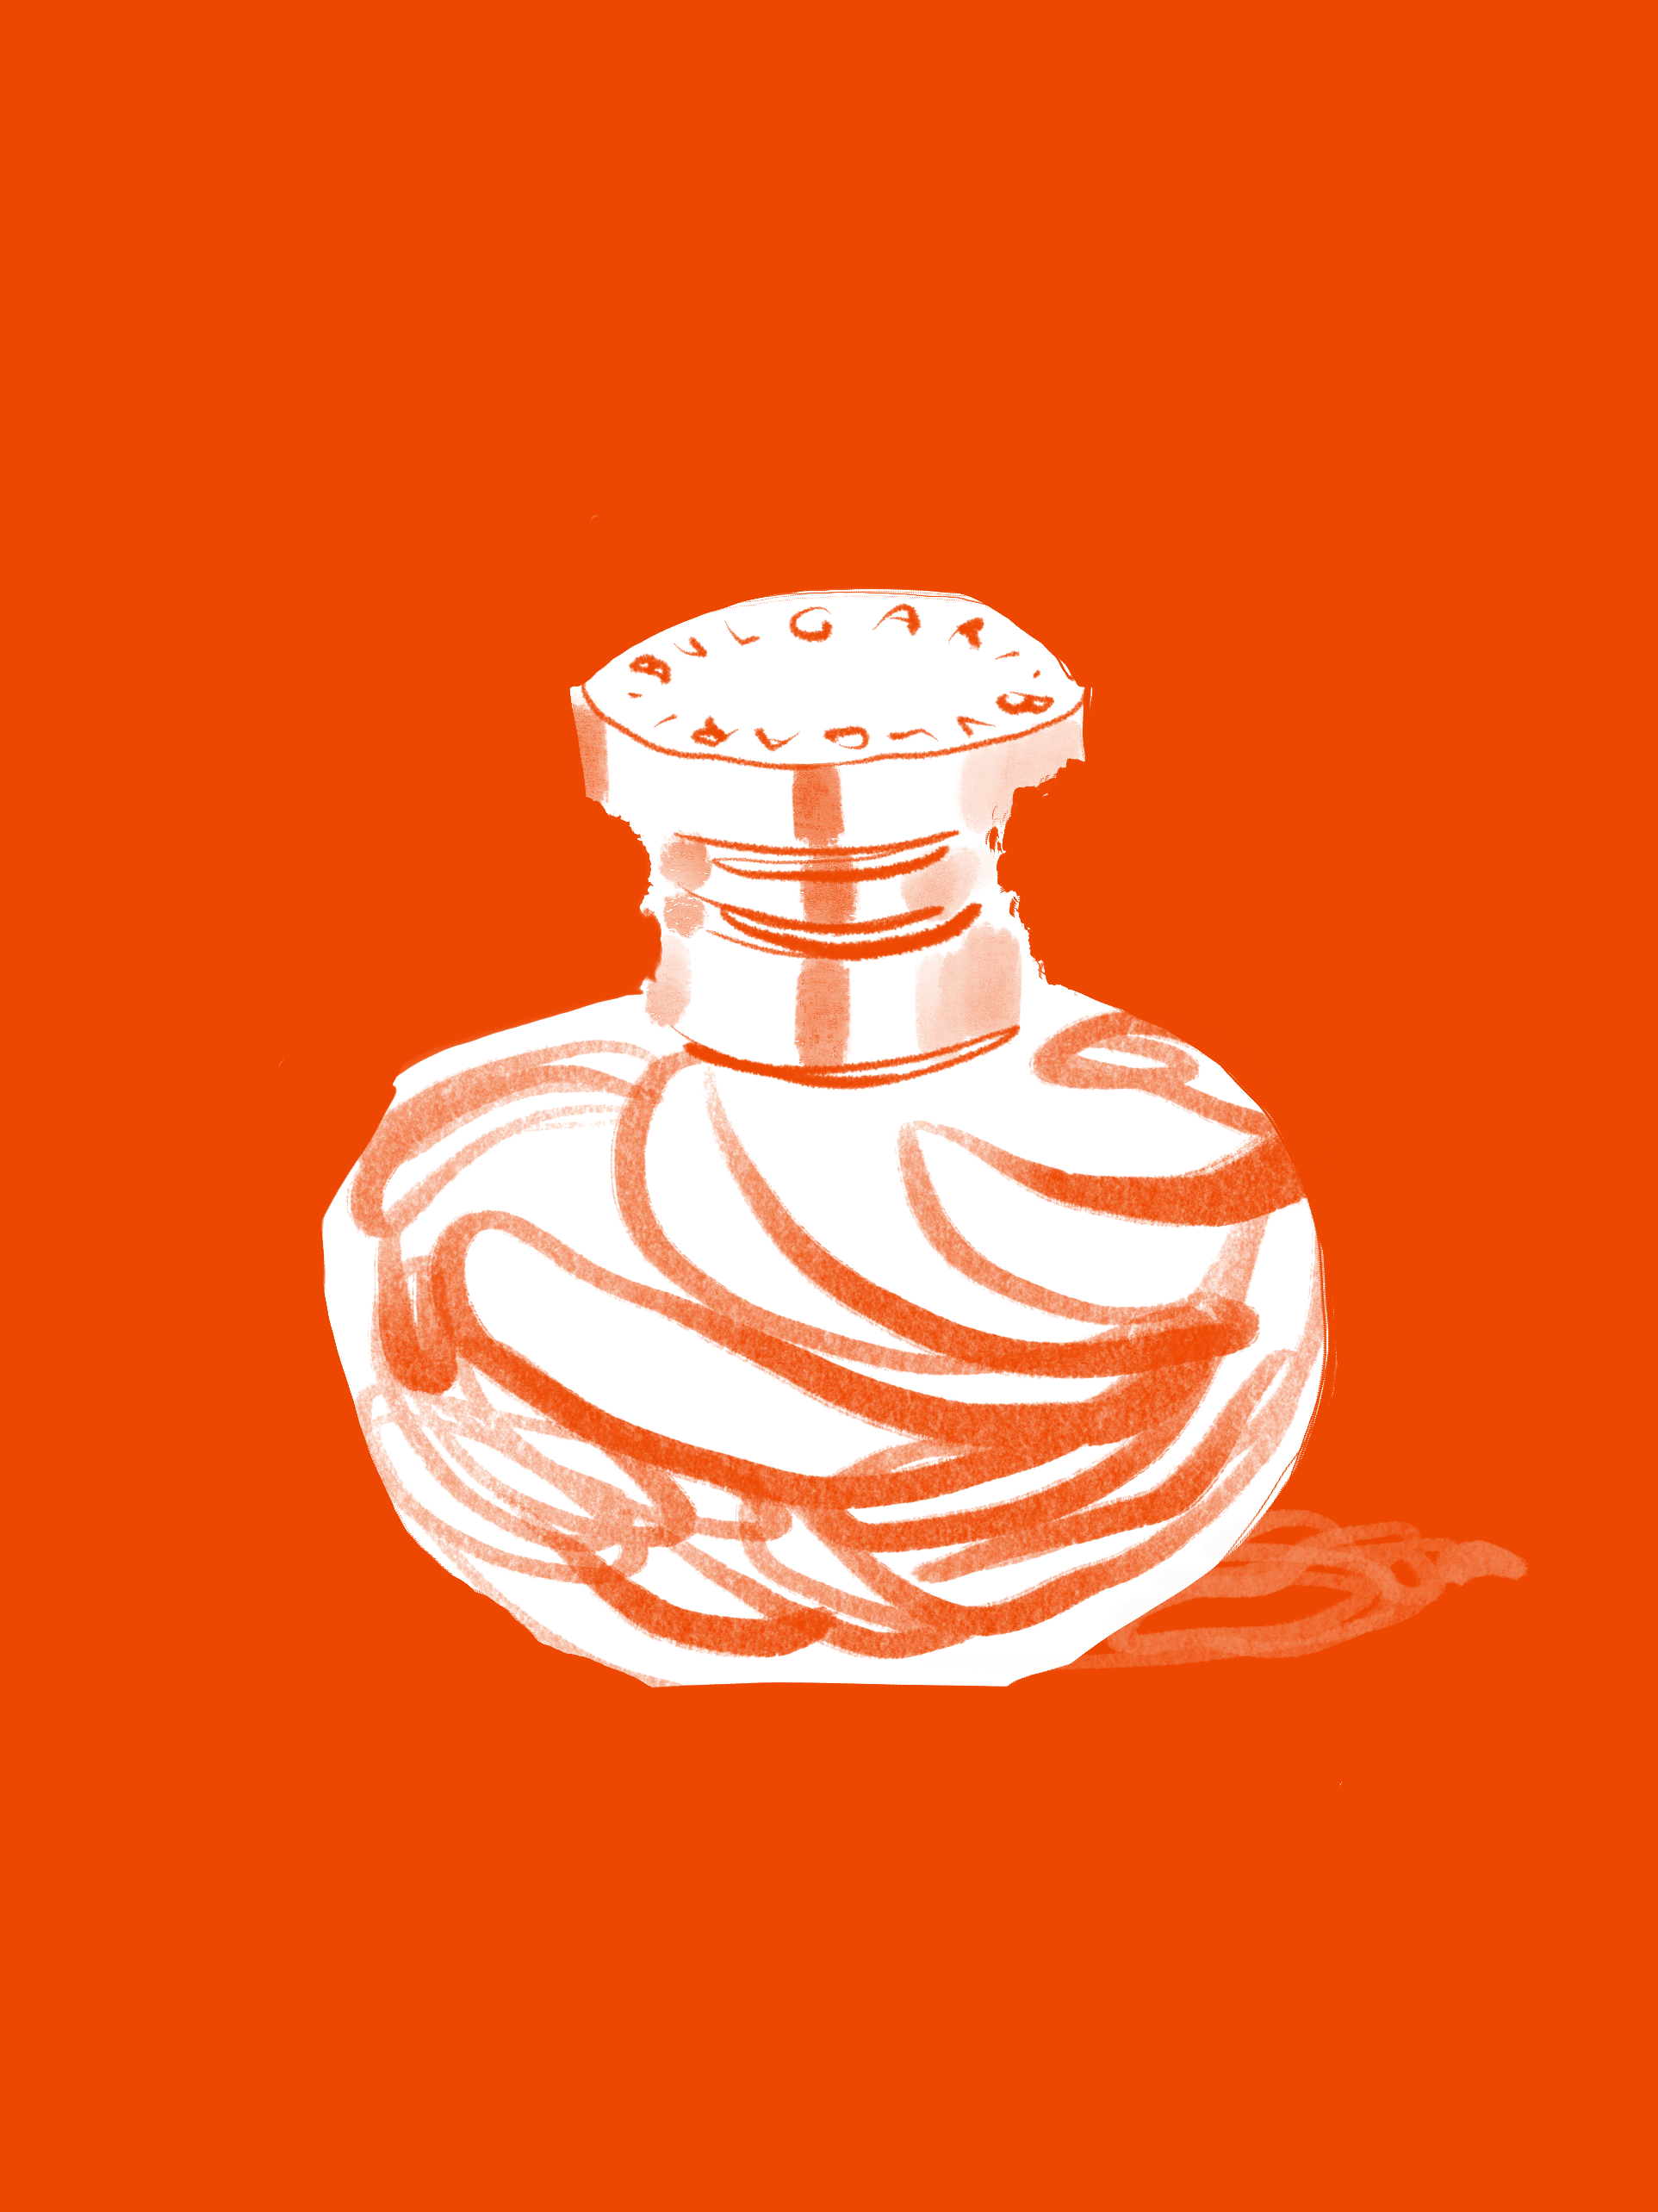 Orange perfume bottle, beauty illustration by Silvana Mariani